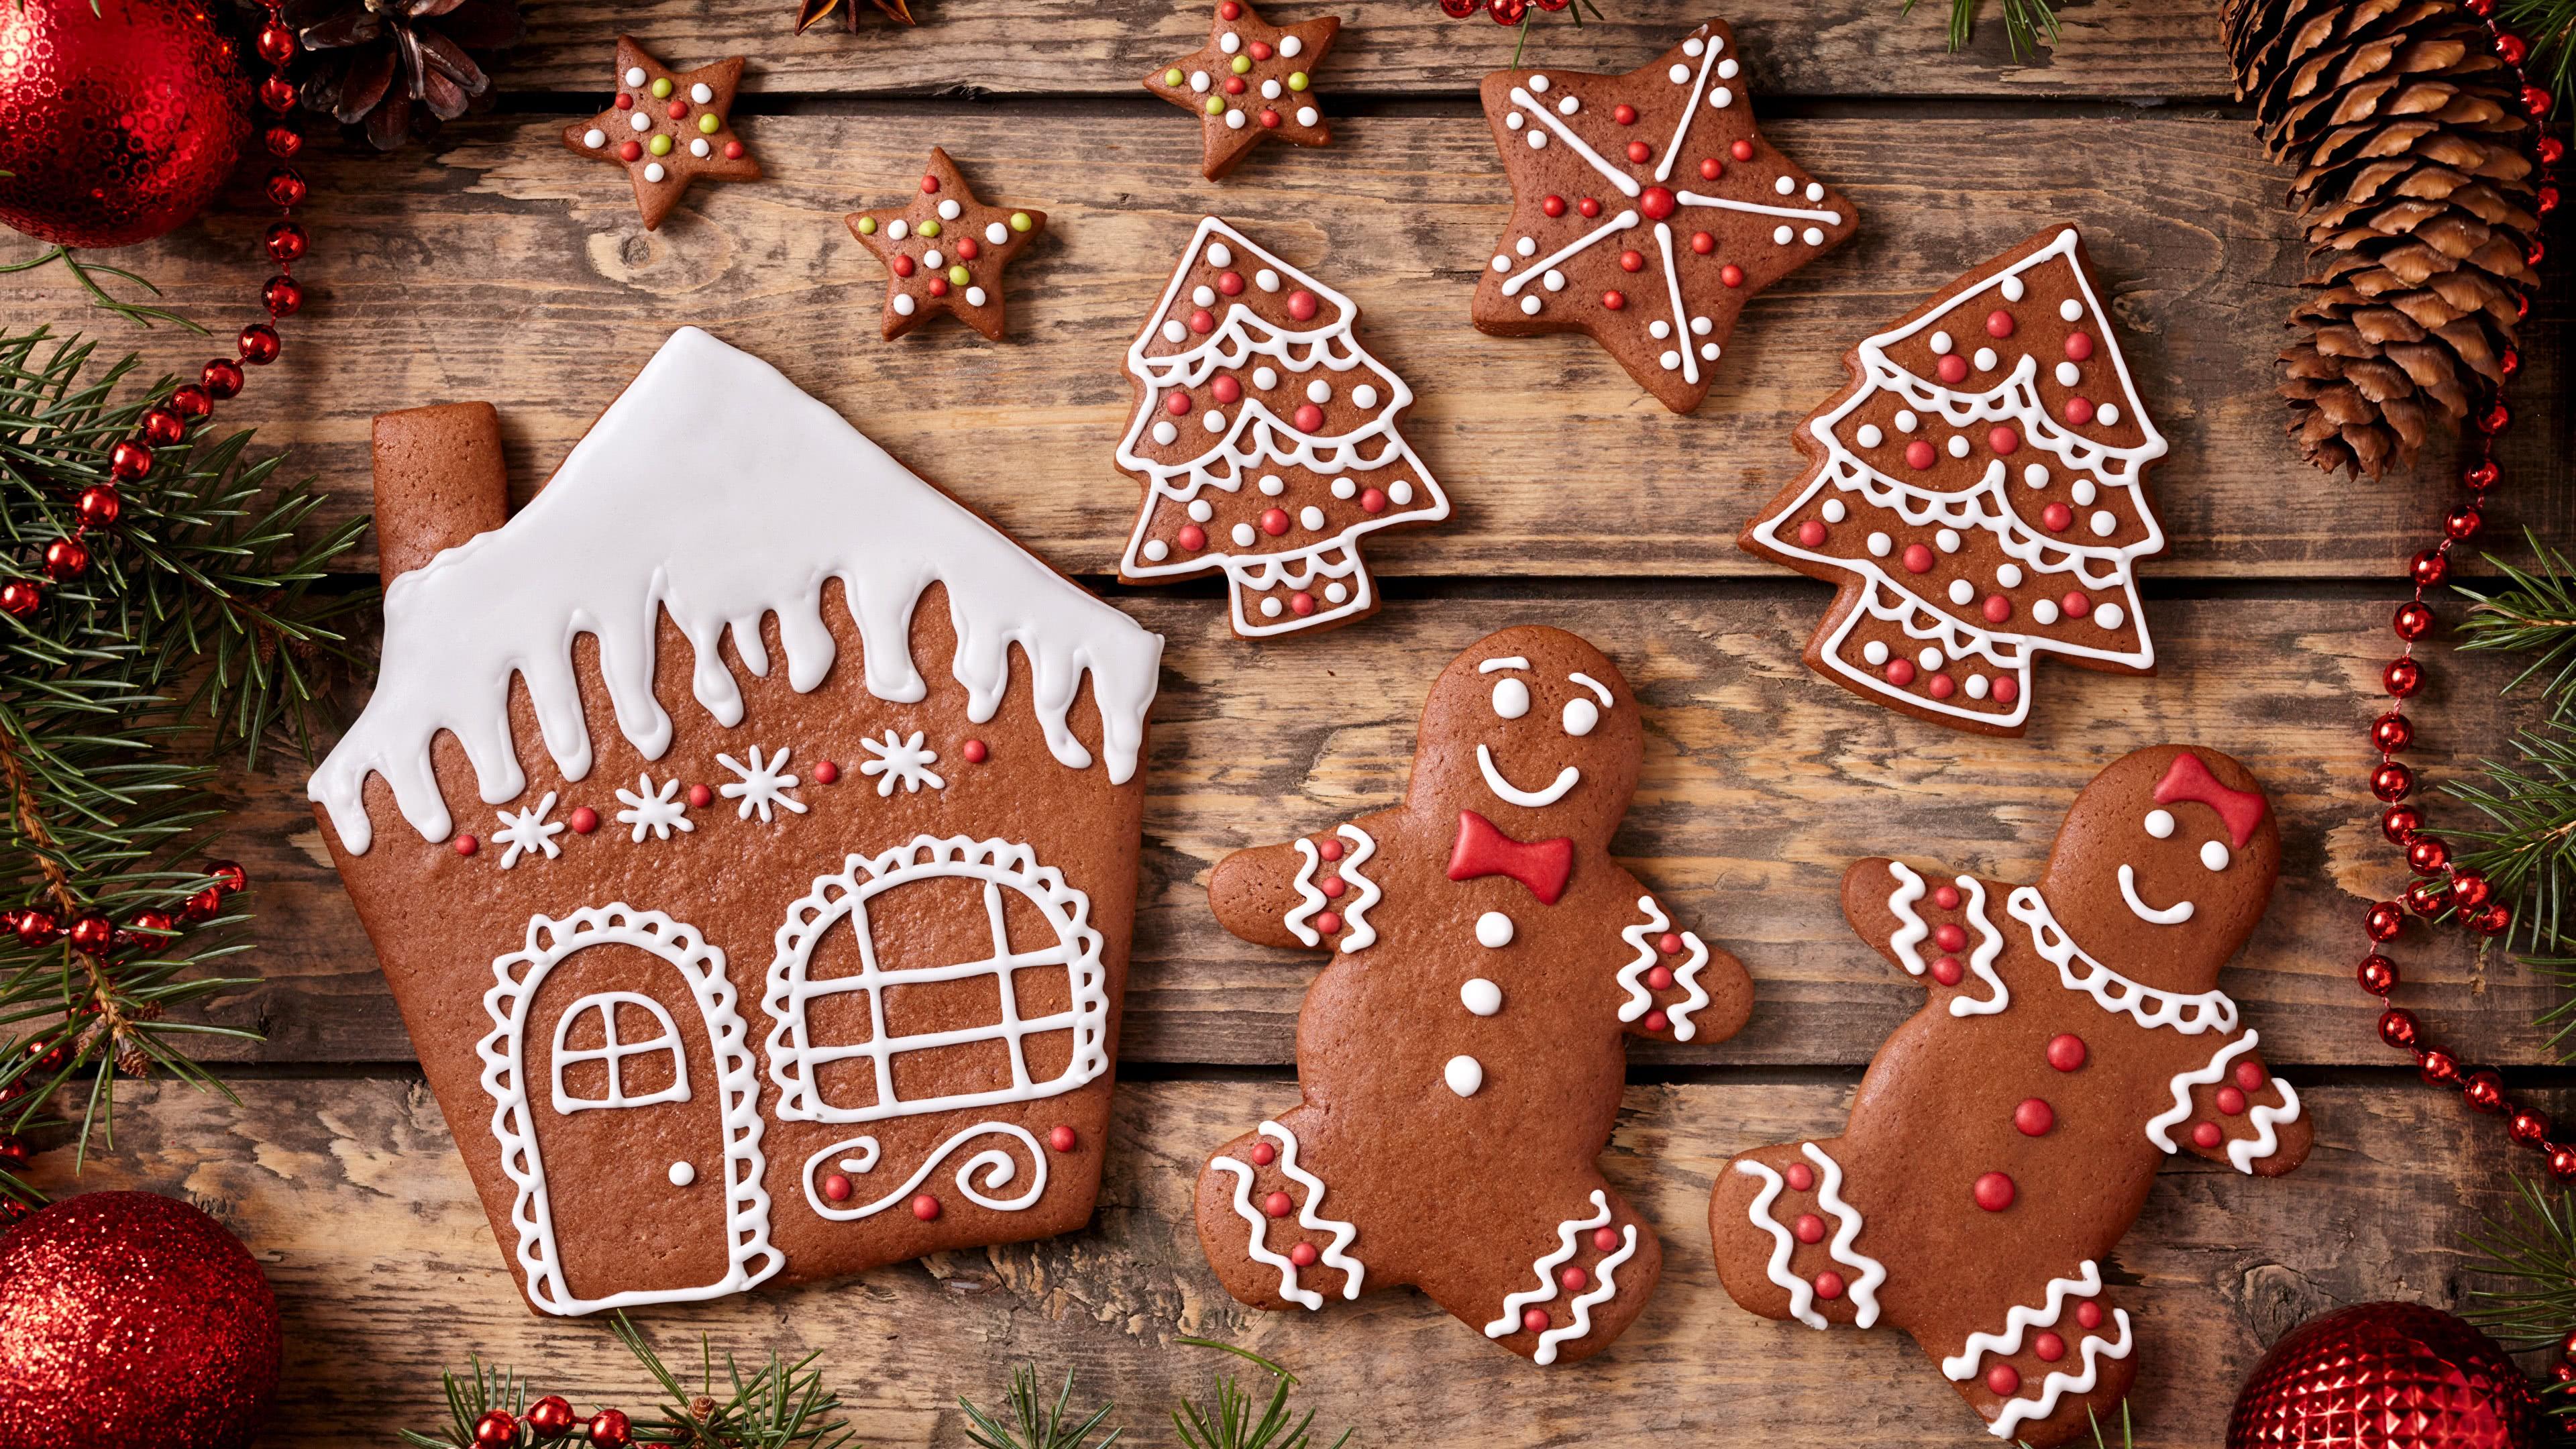 christmas gingerbread house and gingerbread men uhd 4k wallpaper